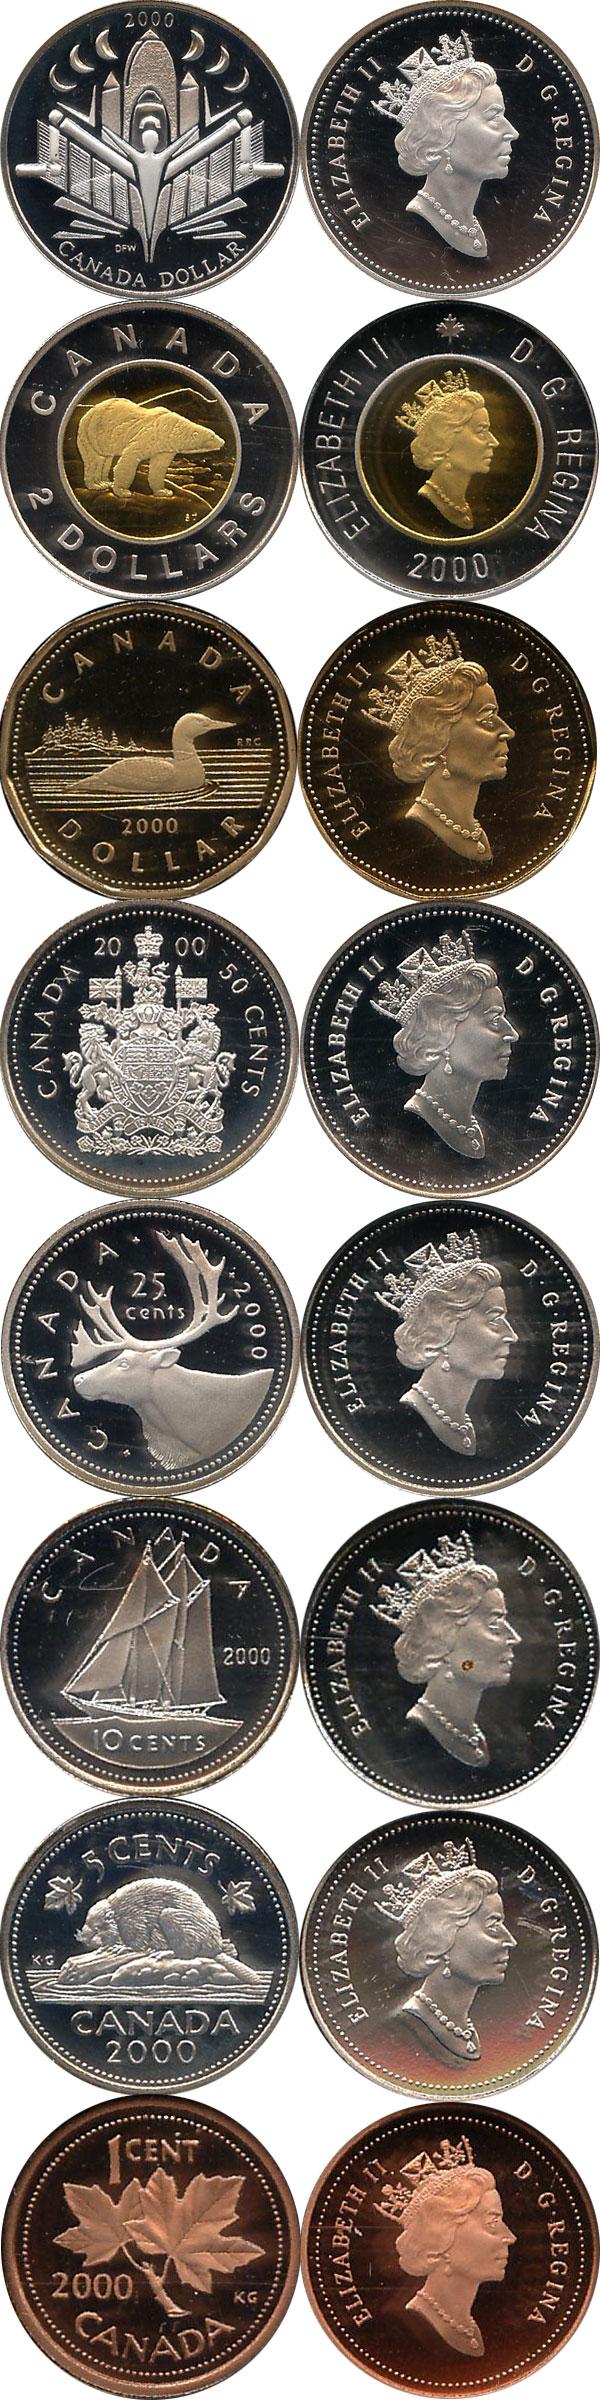 Картинка Подарочные монеты Канада Набор 2000 года  2000